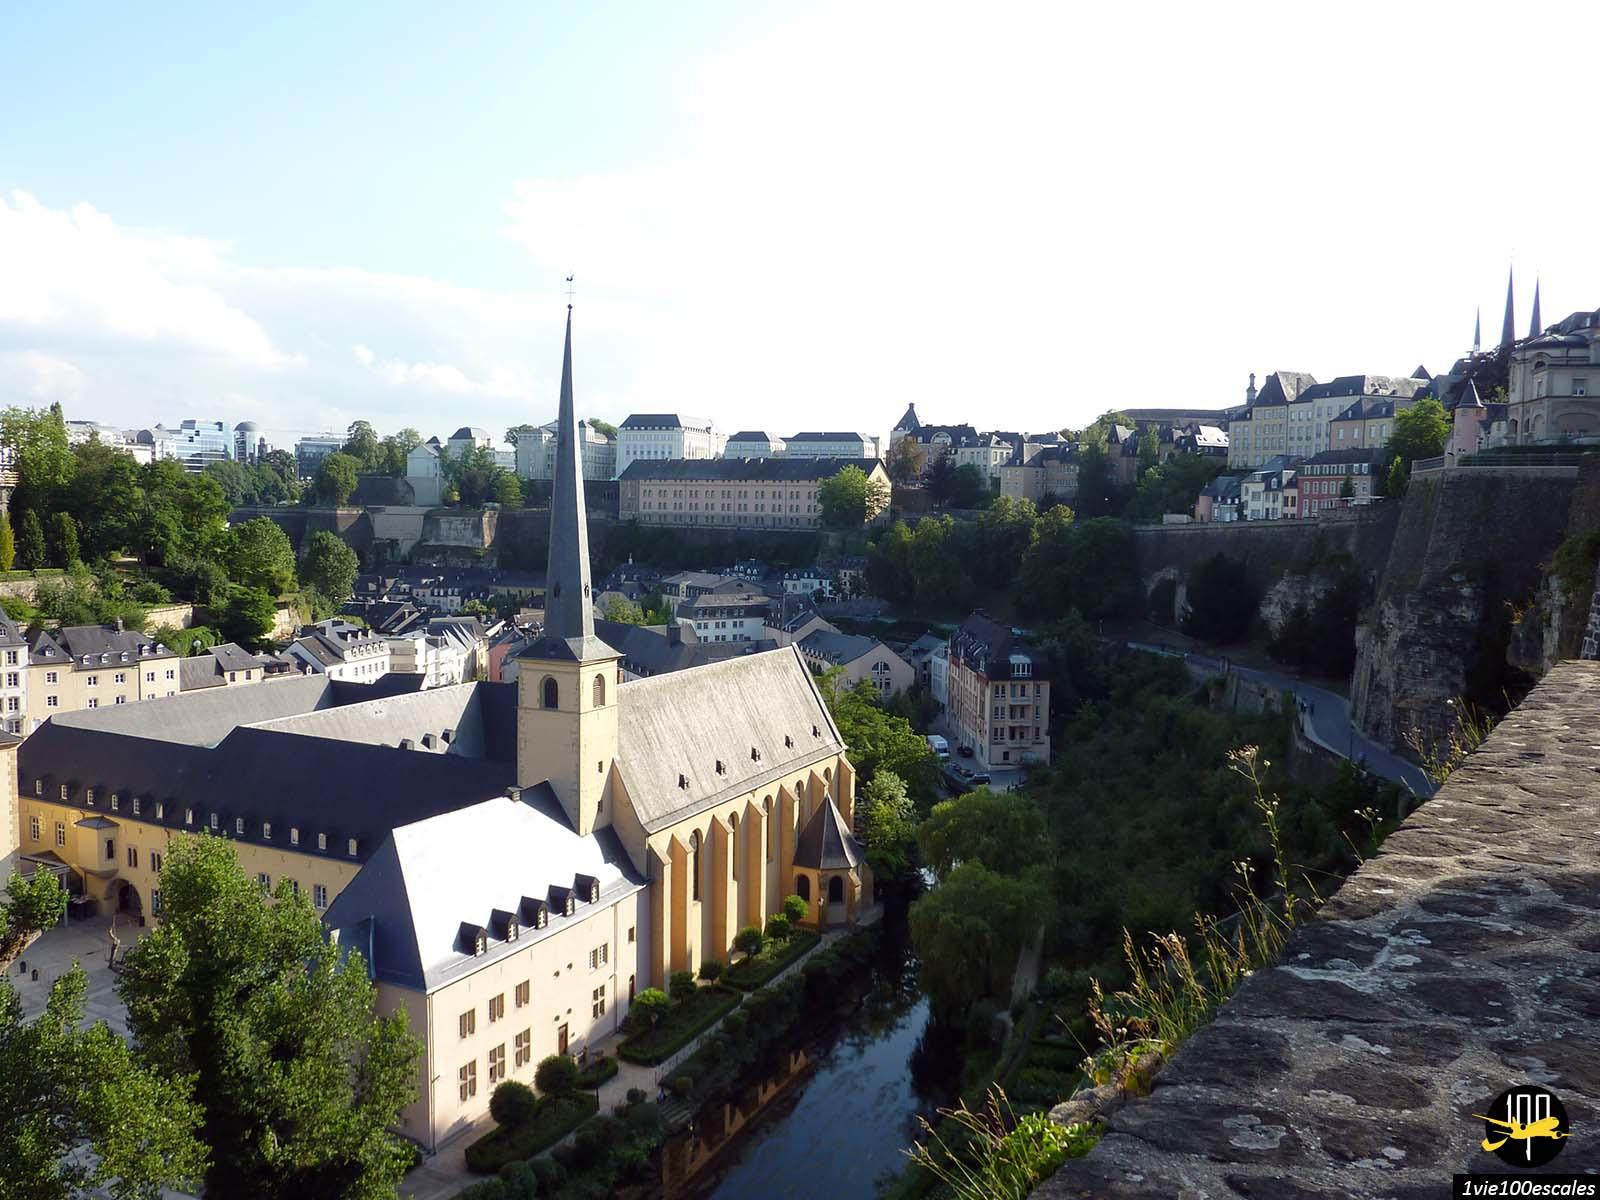 Escale #019 Luxembourg